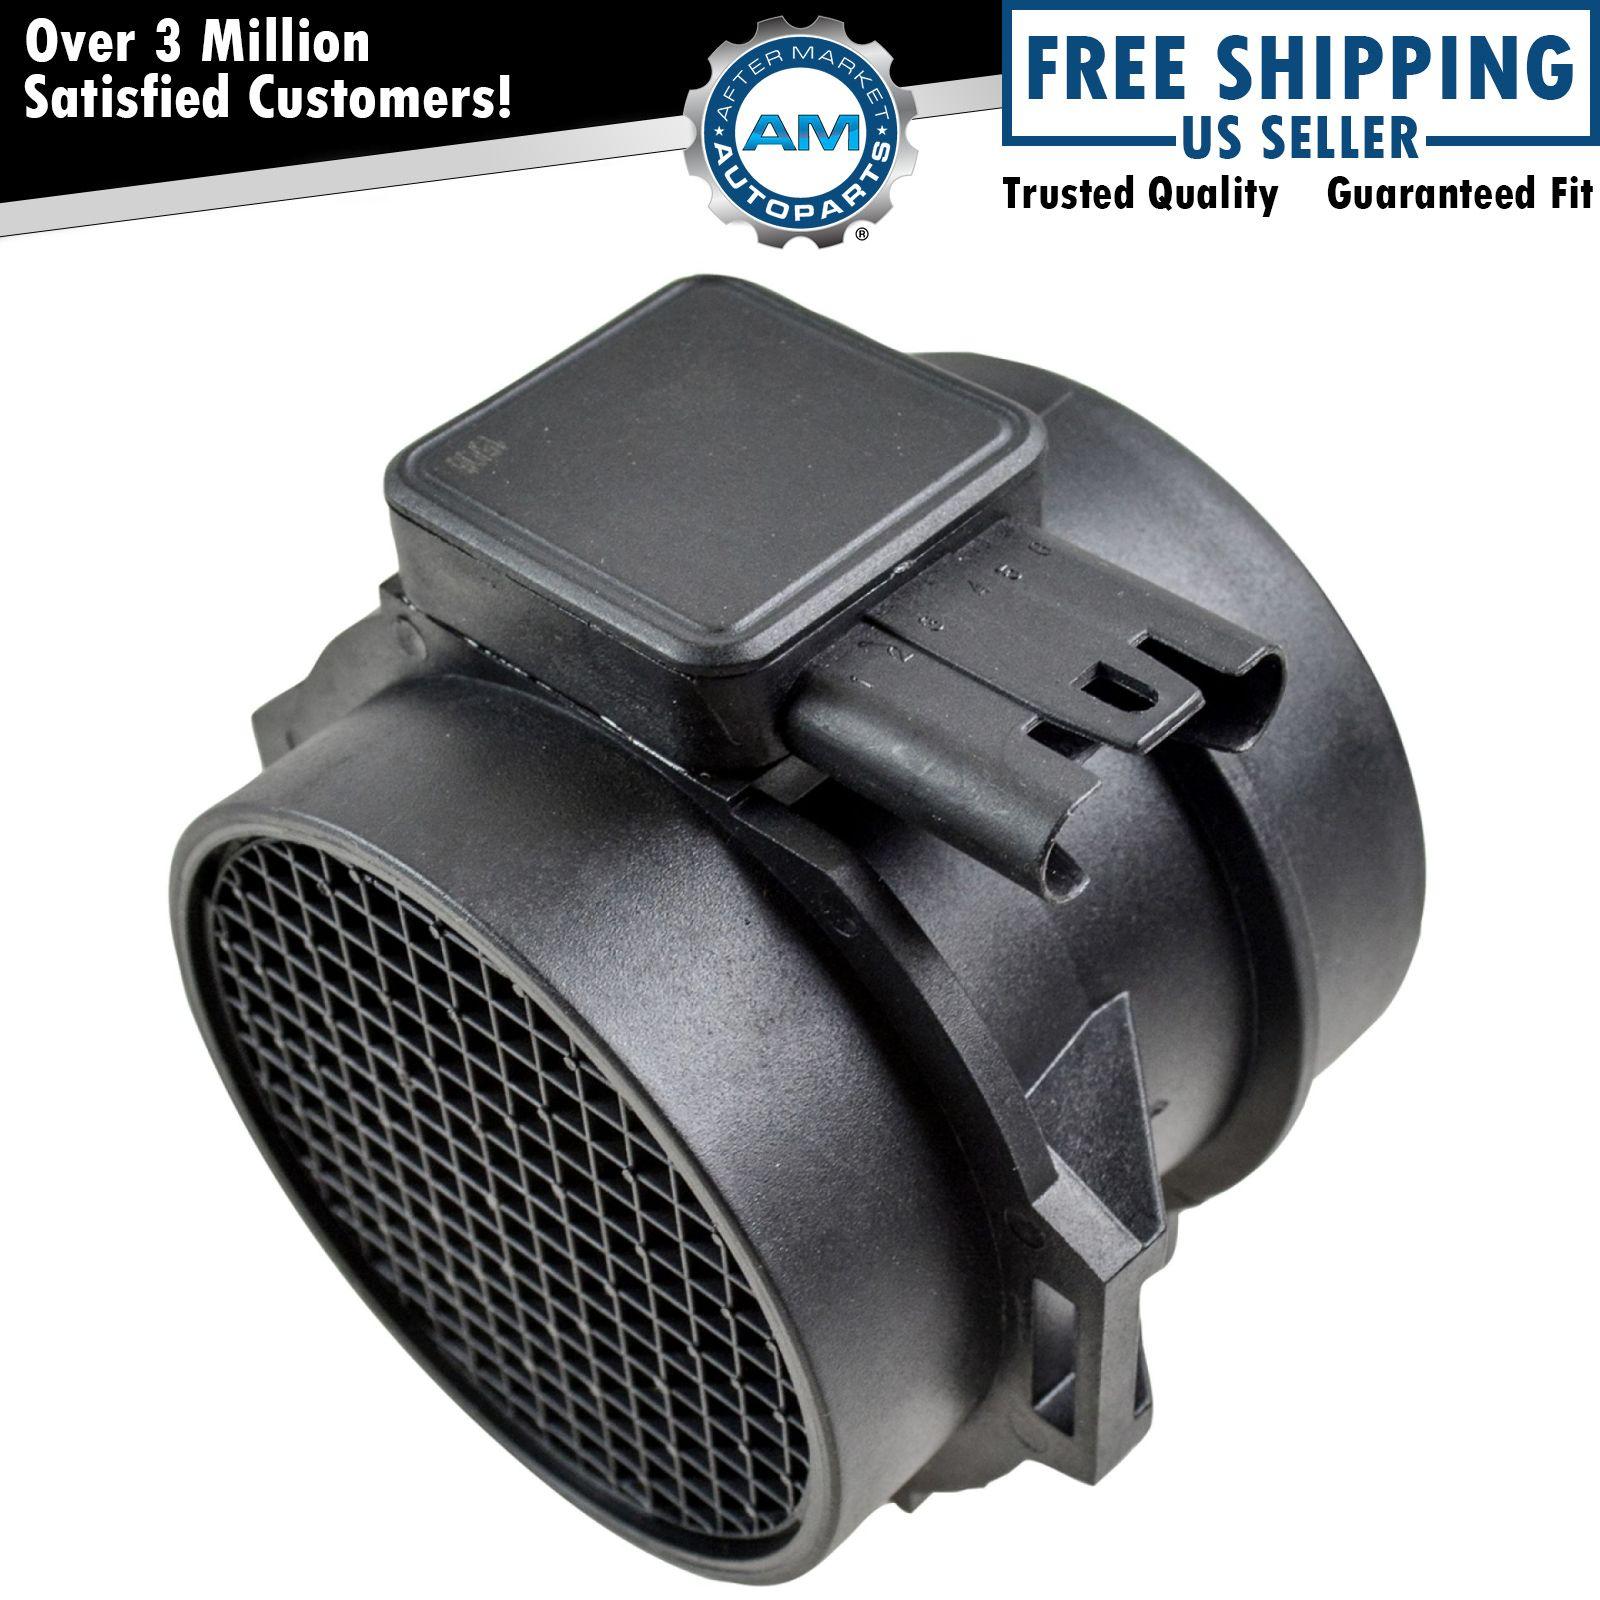 Mass Air Flow Meter Sensor W Housing For Bmw 325i 325ci X3